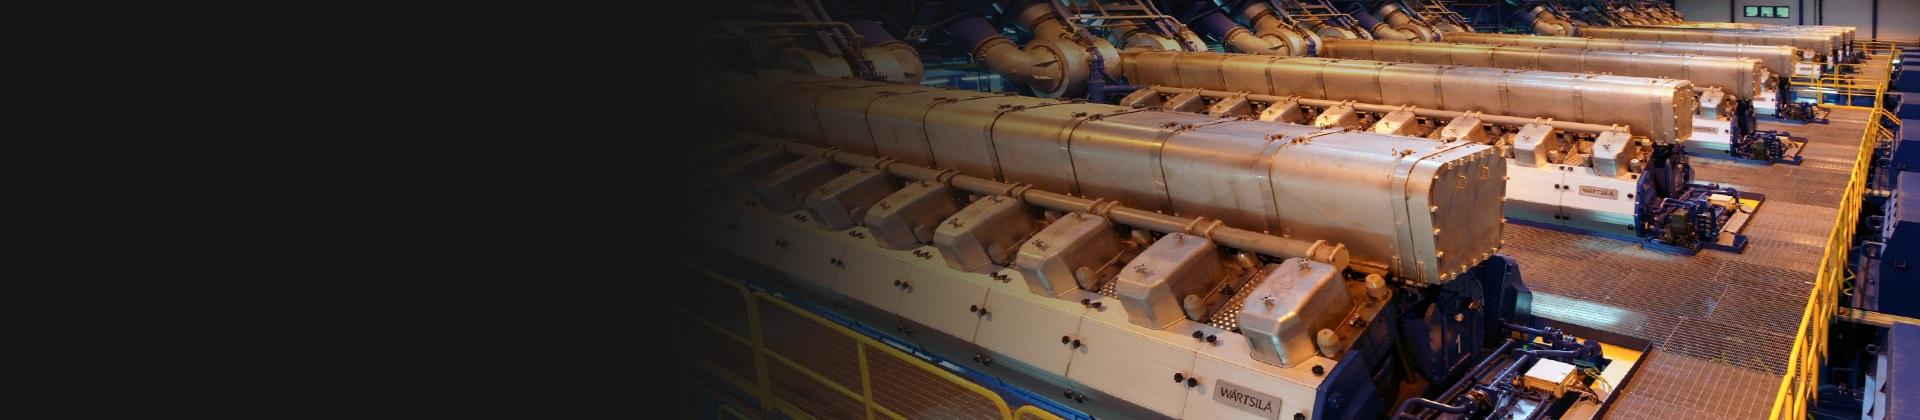 Power Plants Technology